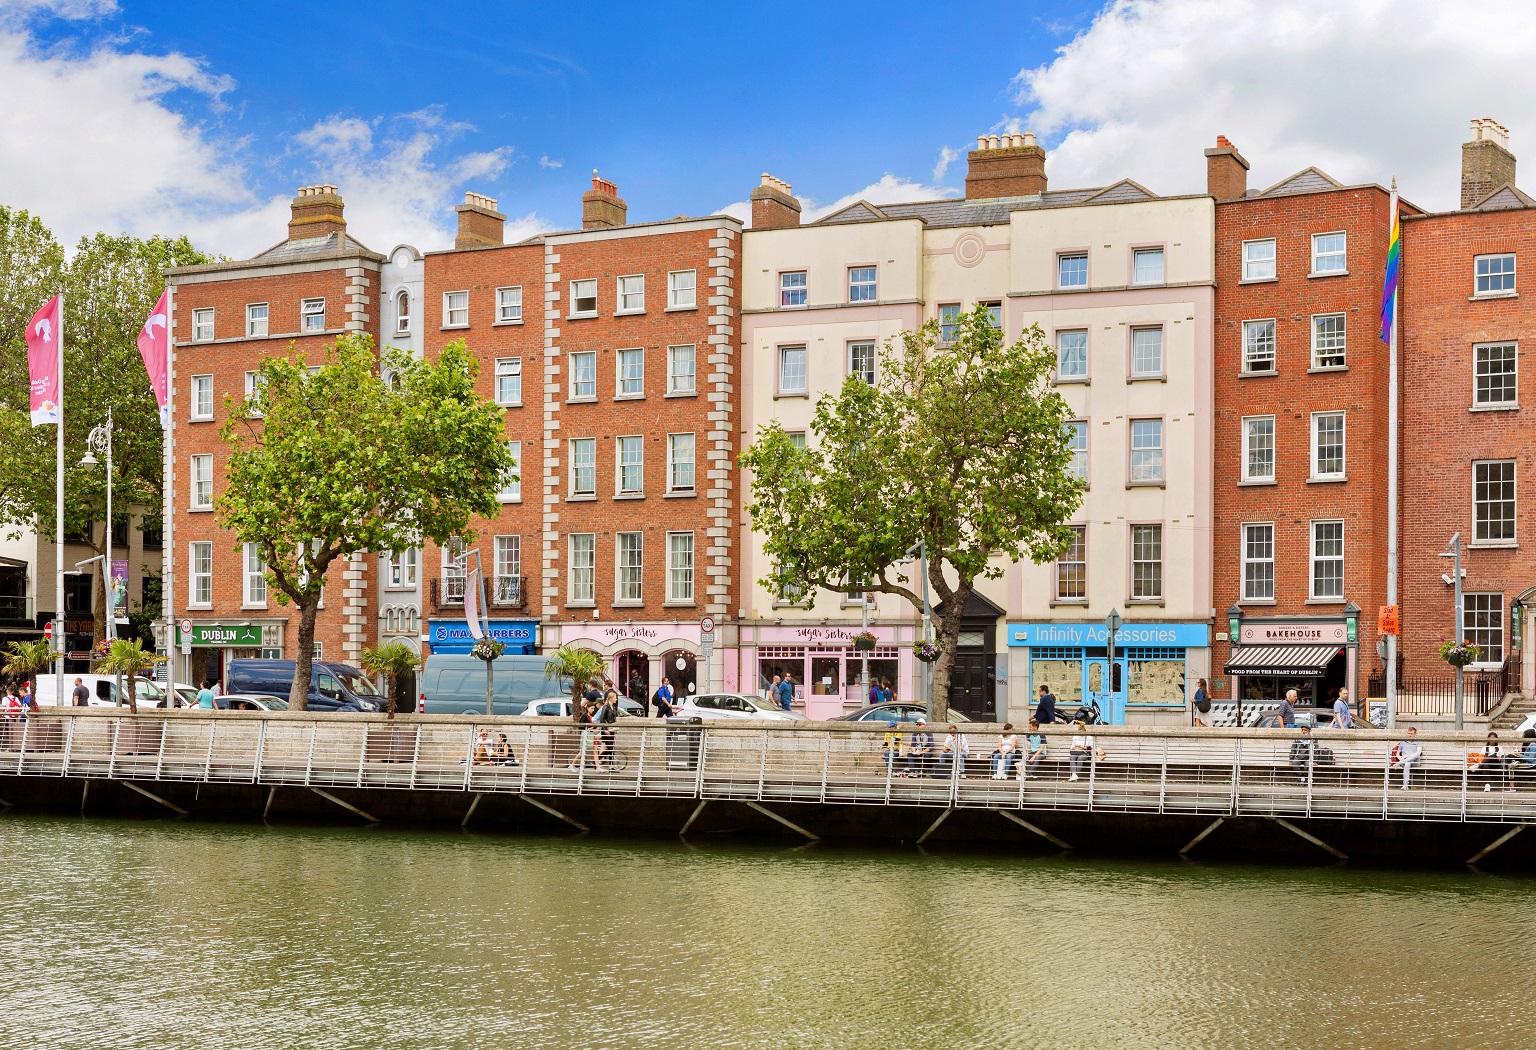 71 Bachelors Walk Apartments, Dublin 1.